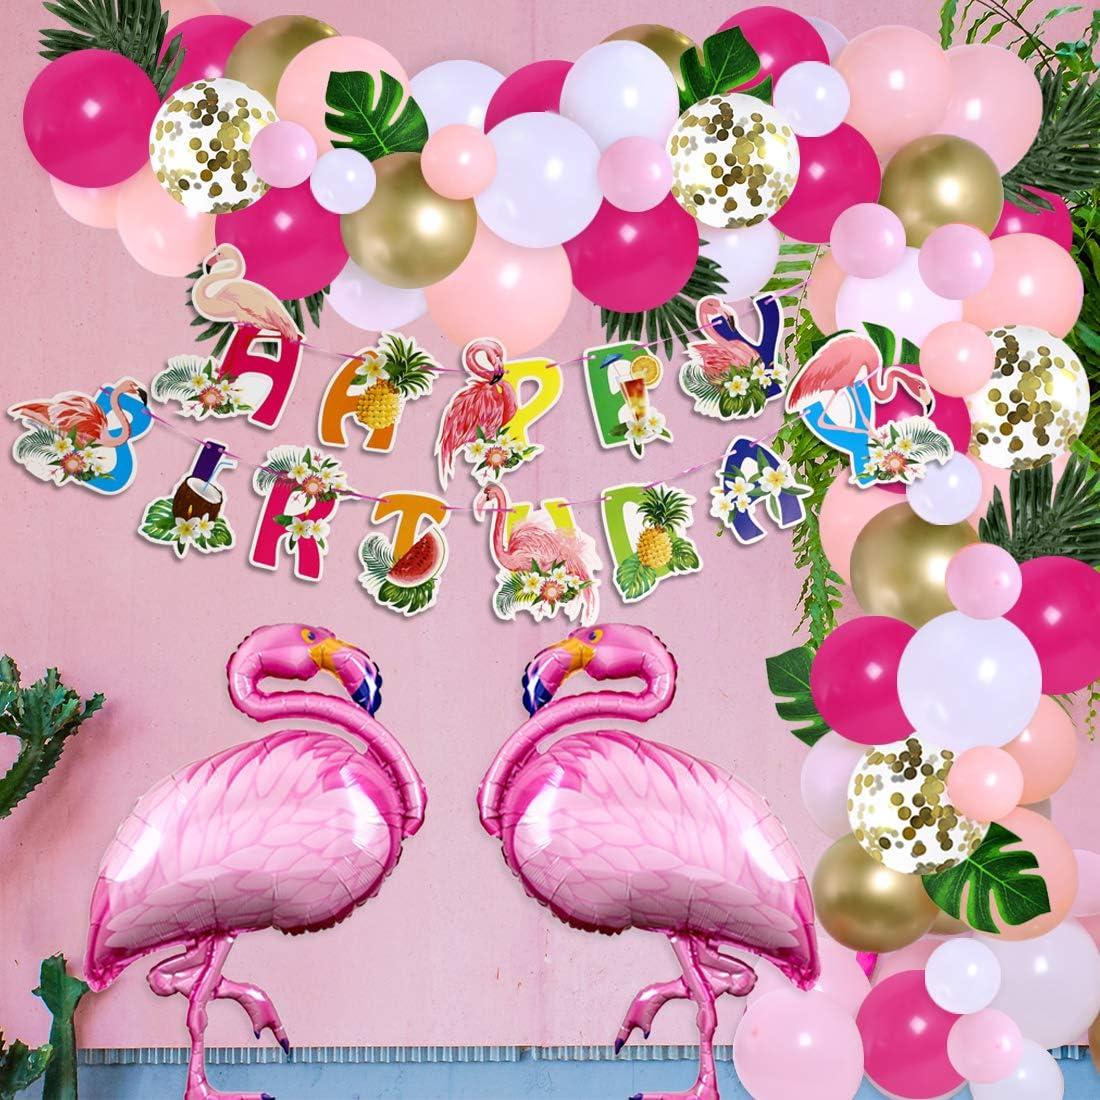 Flamingo Birthday Party Decorations for Girls Tropical Balloon Garland Arch Kit Flamingo Pineapple Happy Birthday Banner Hawaiian Luau Aloha Party Supplies 100 Pack